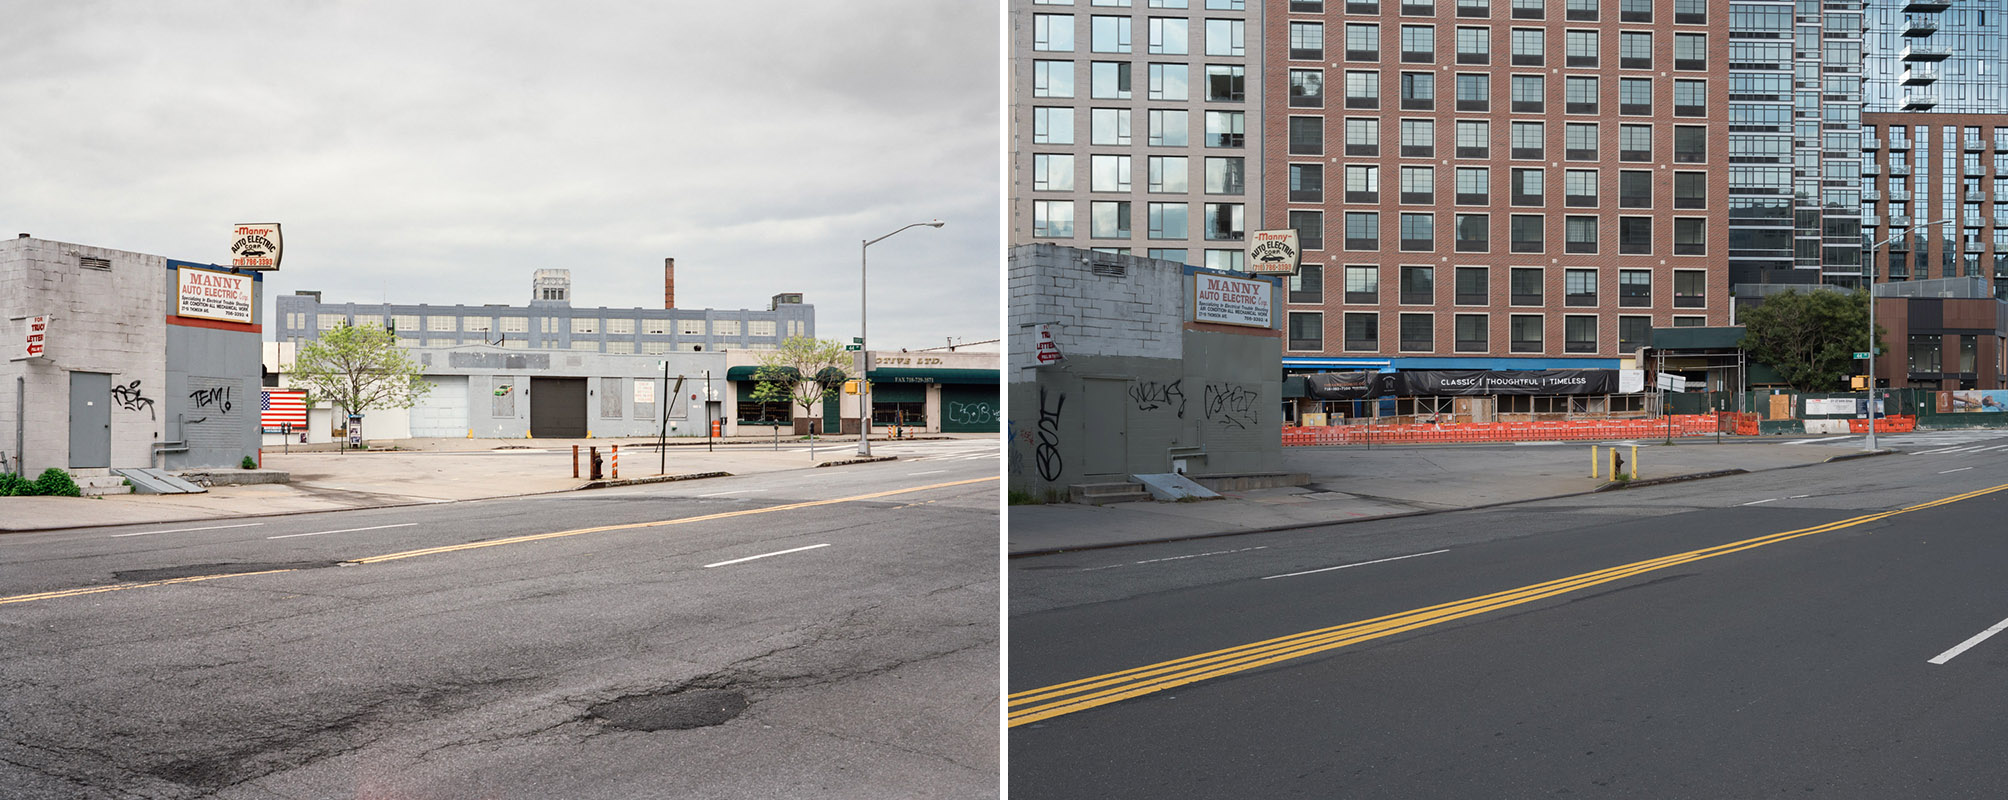 Thomson Ave., Long Island City, New York, 2005/2017